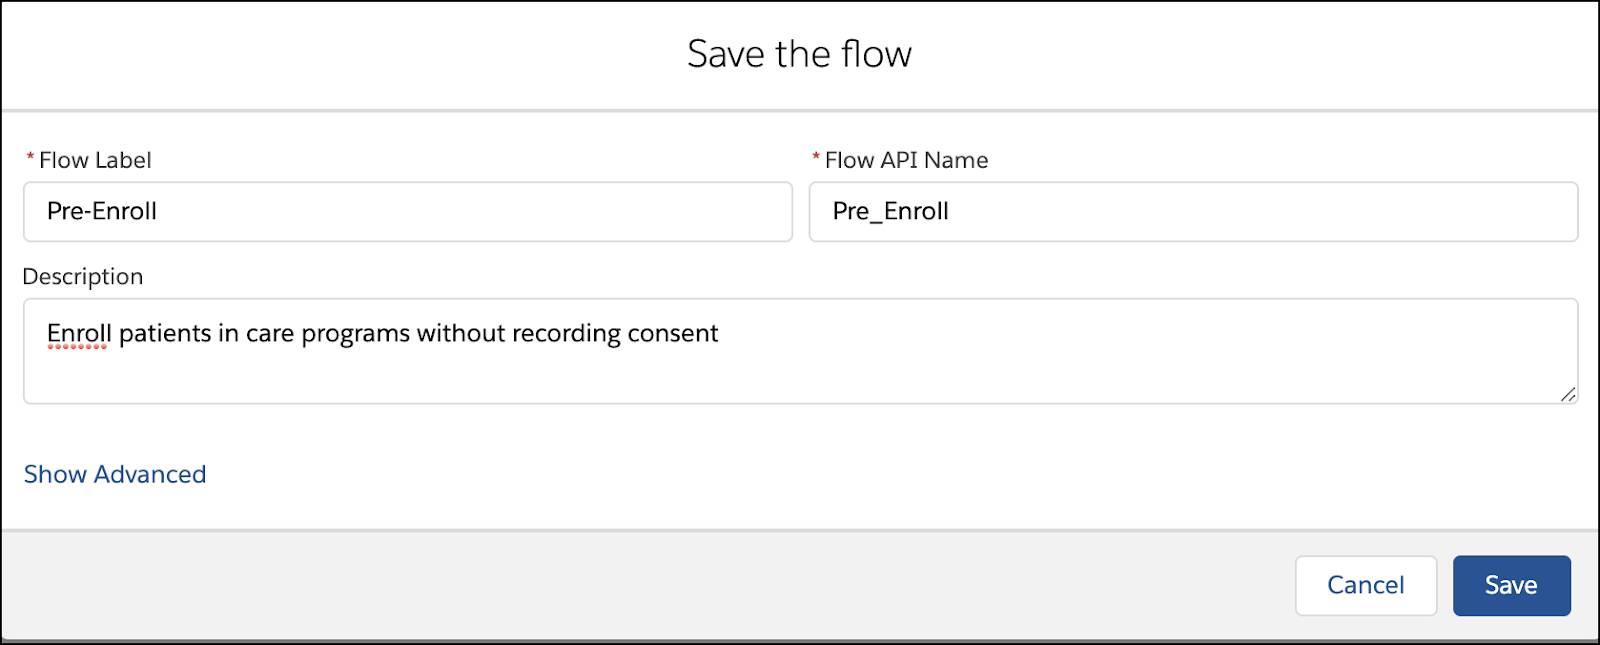 Saving the new flow corresponding to the preceding steps.